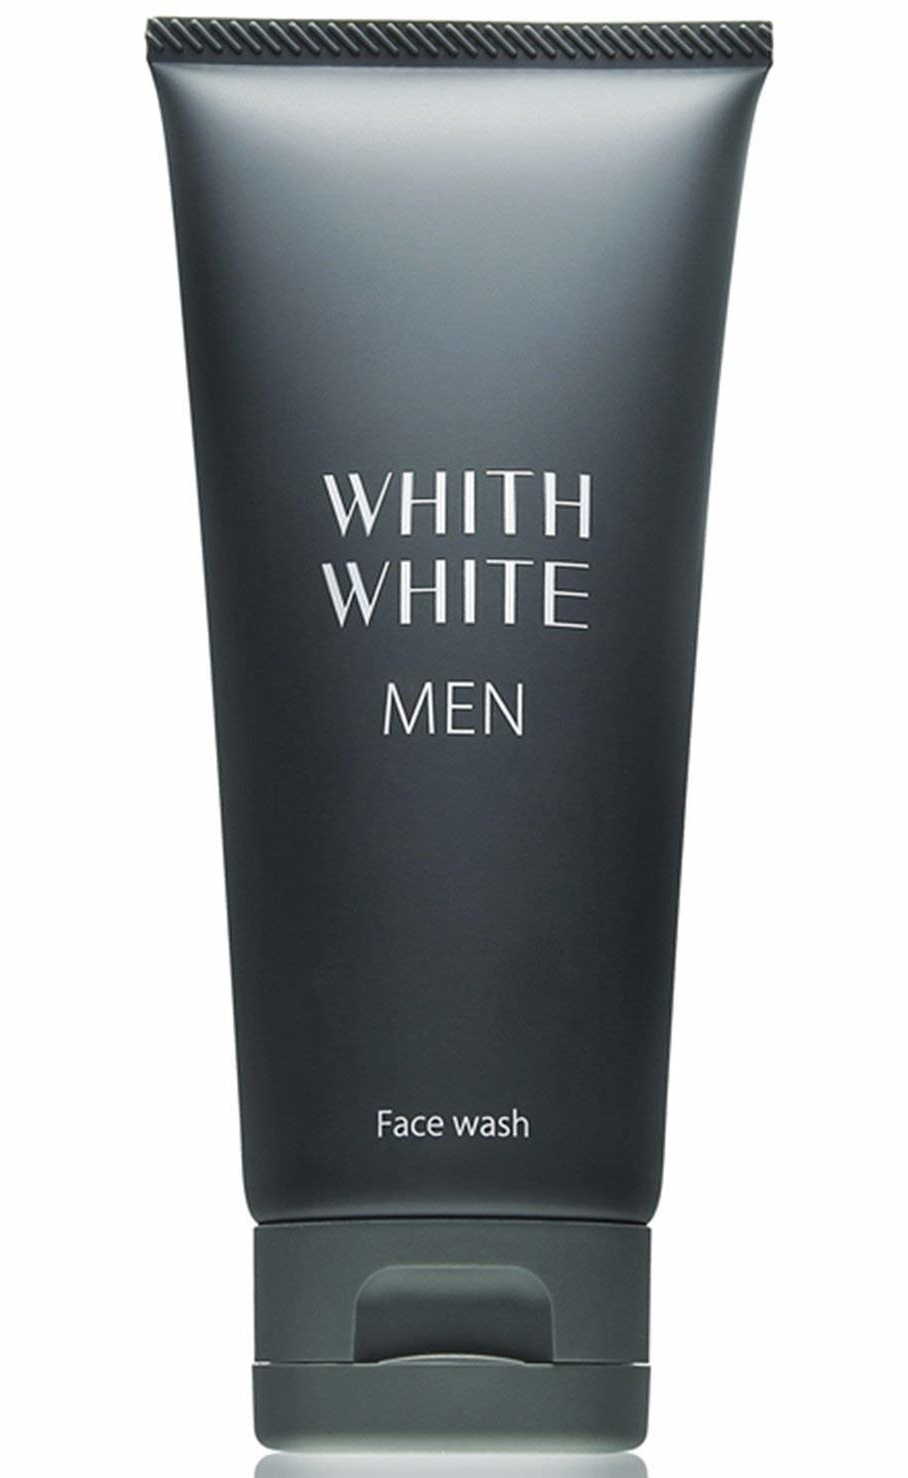 WHITH WHITE MEN|フェイスウォッシュ